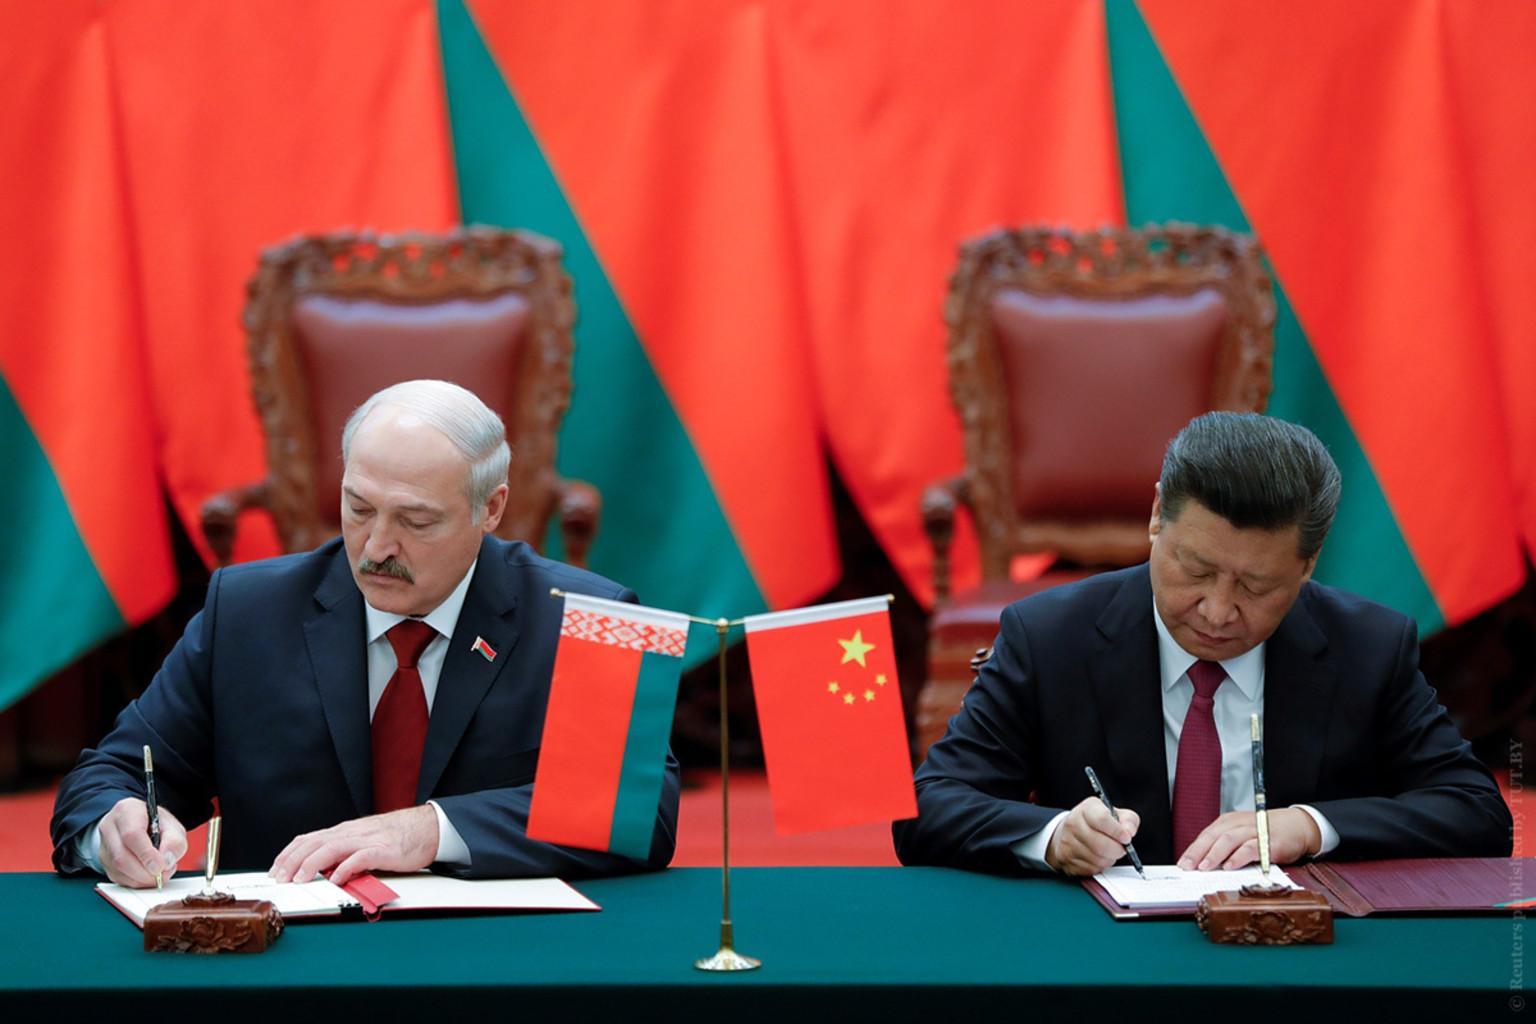 Lukashenko kitay 20160929 rtsq0go